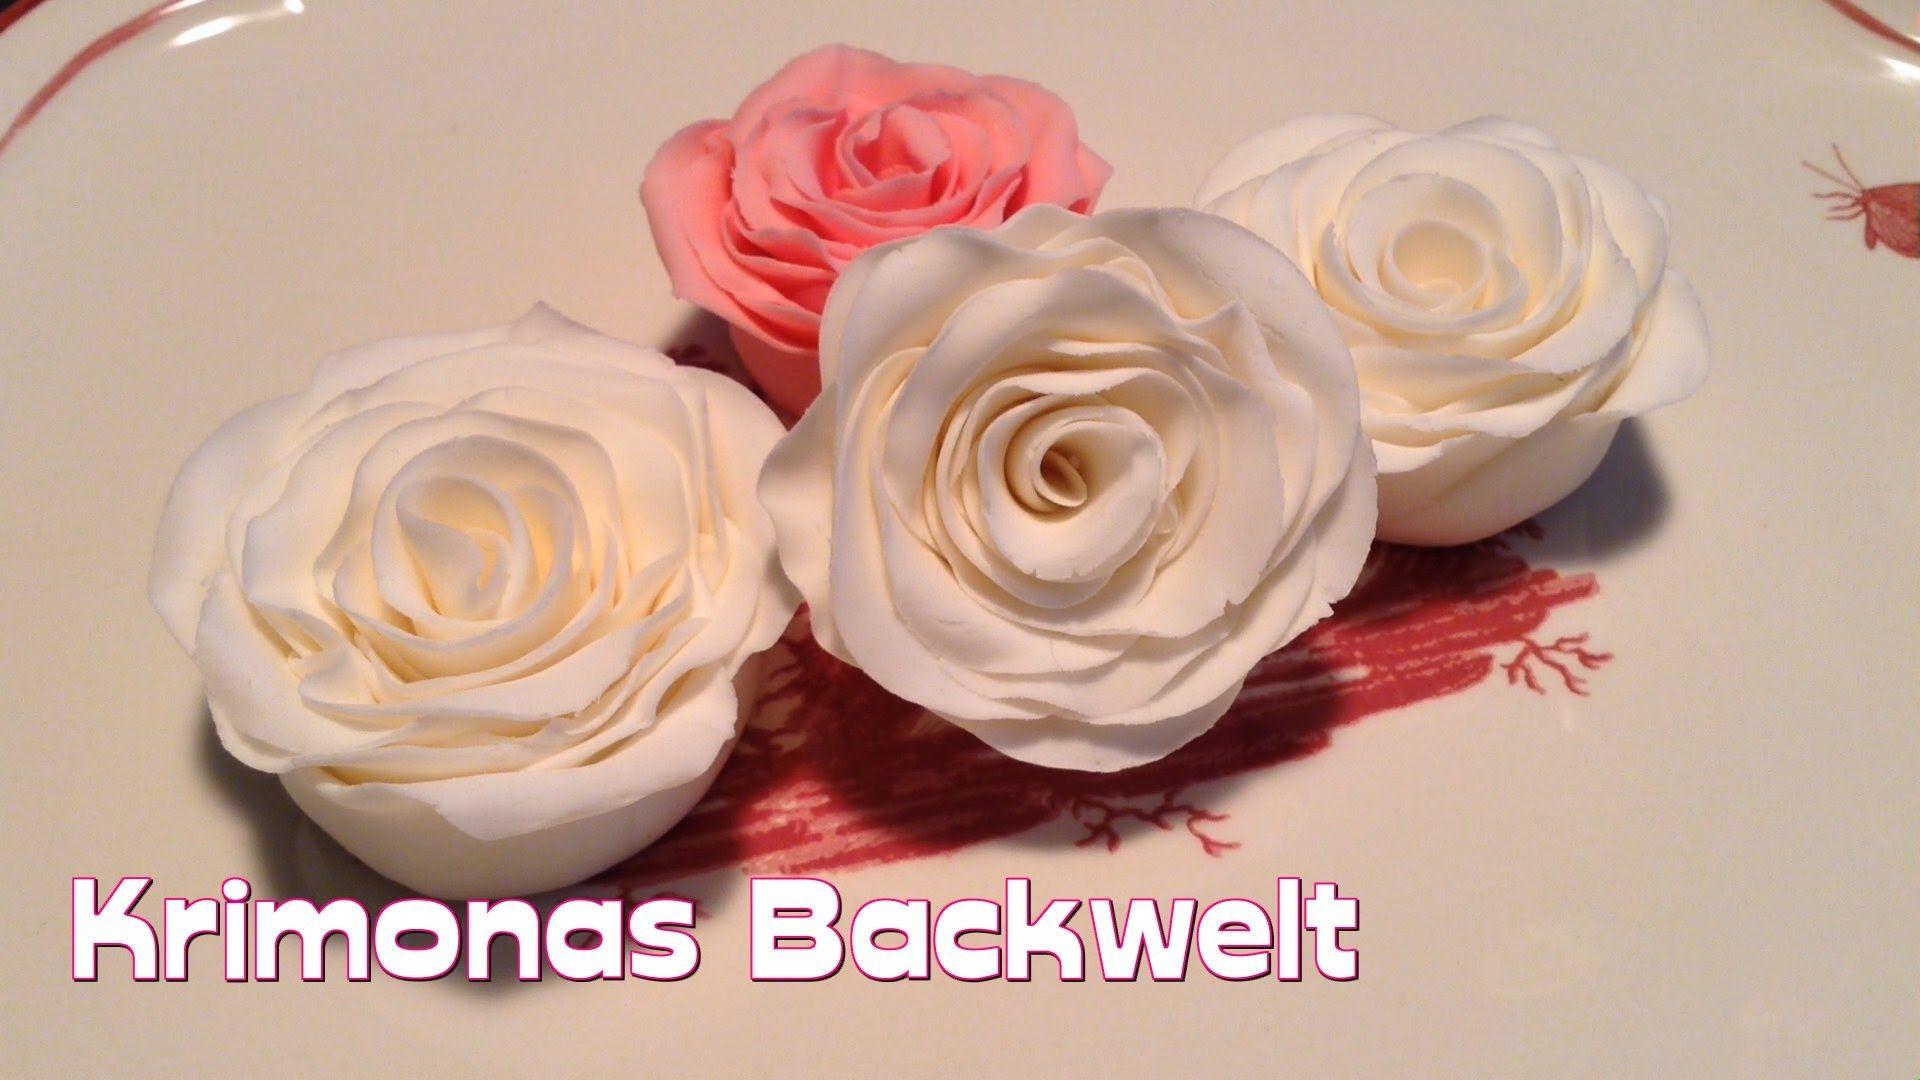 fondant rose mit der wickeltechnik herstellen how to make fondant roses wind technique in. Black Bedroom Furniture Sets. Home Design Ideas